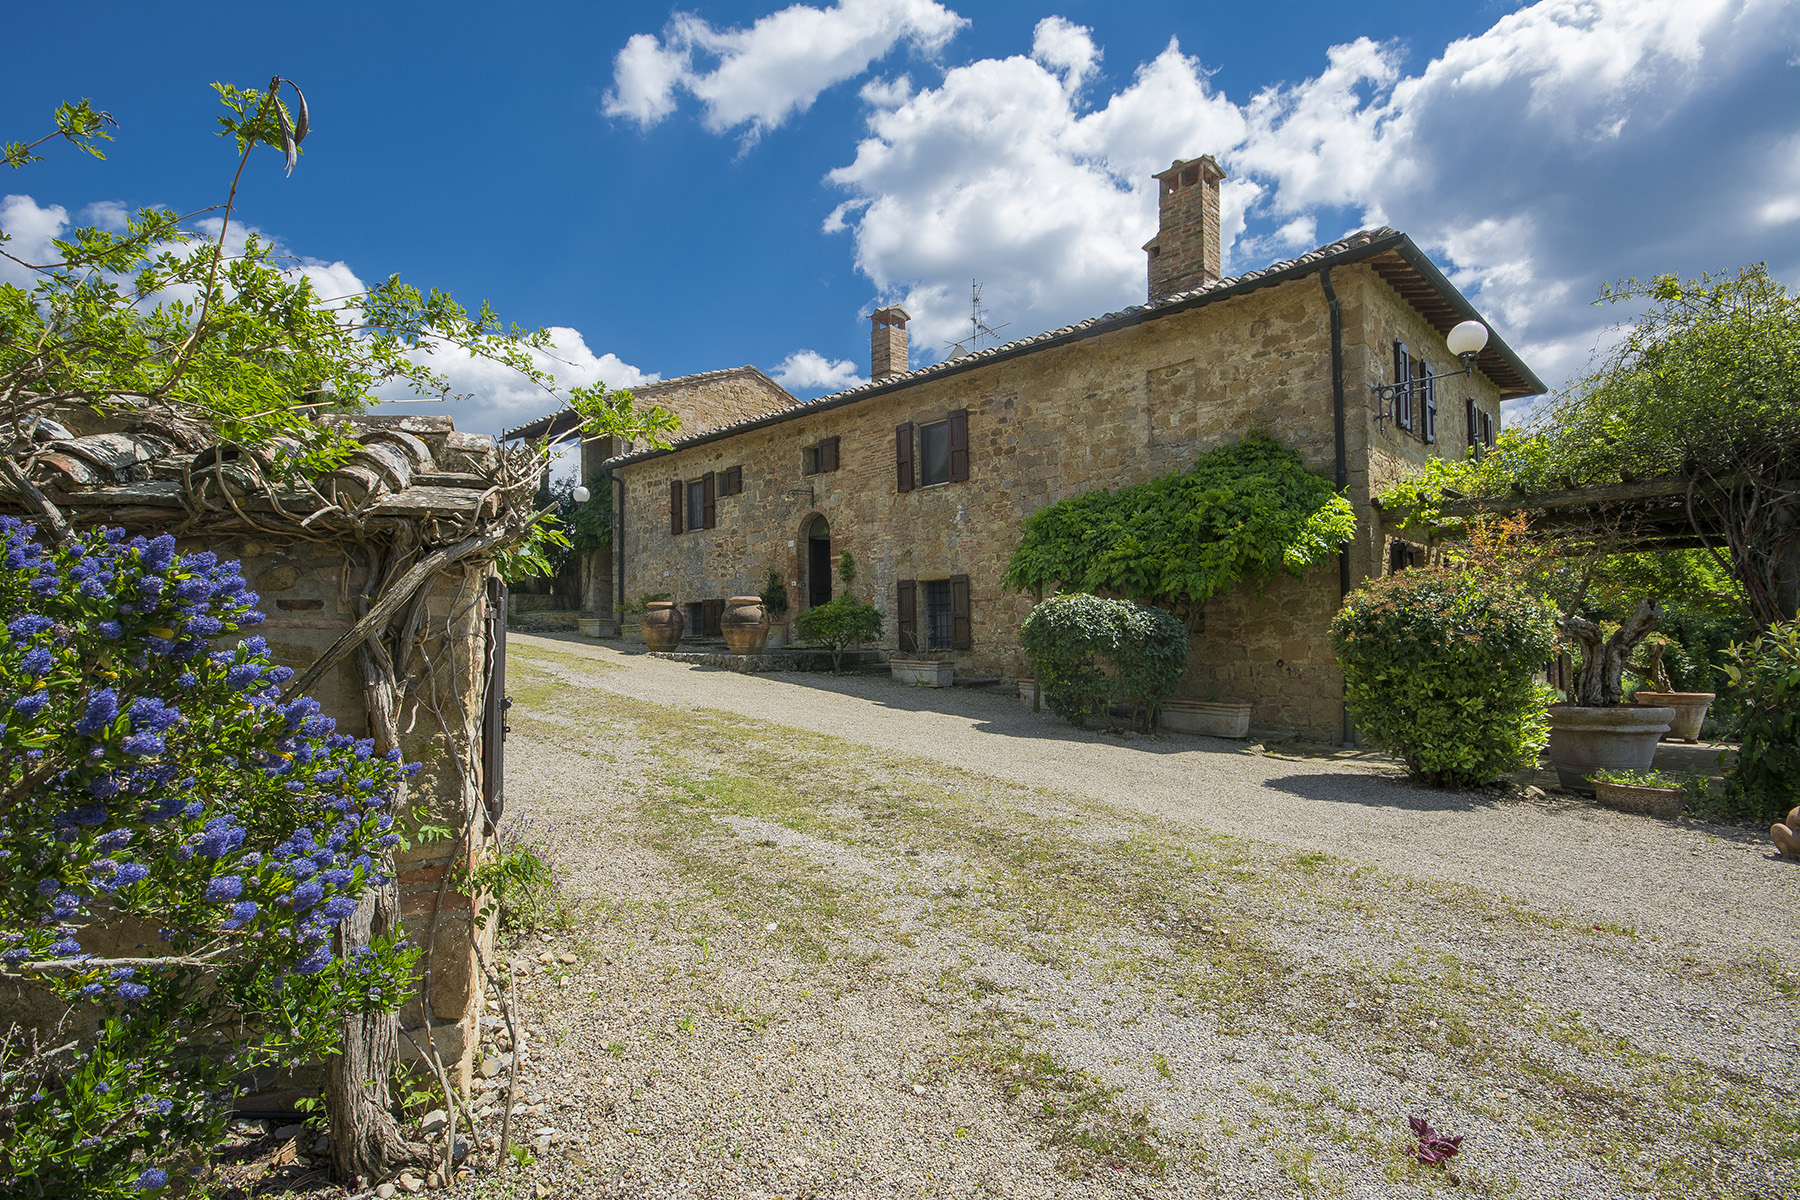 Casa indipendente in Vendita a Pienza: 5 locali, 400 mq - Foto 6